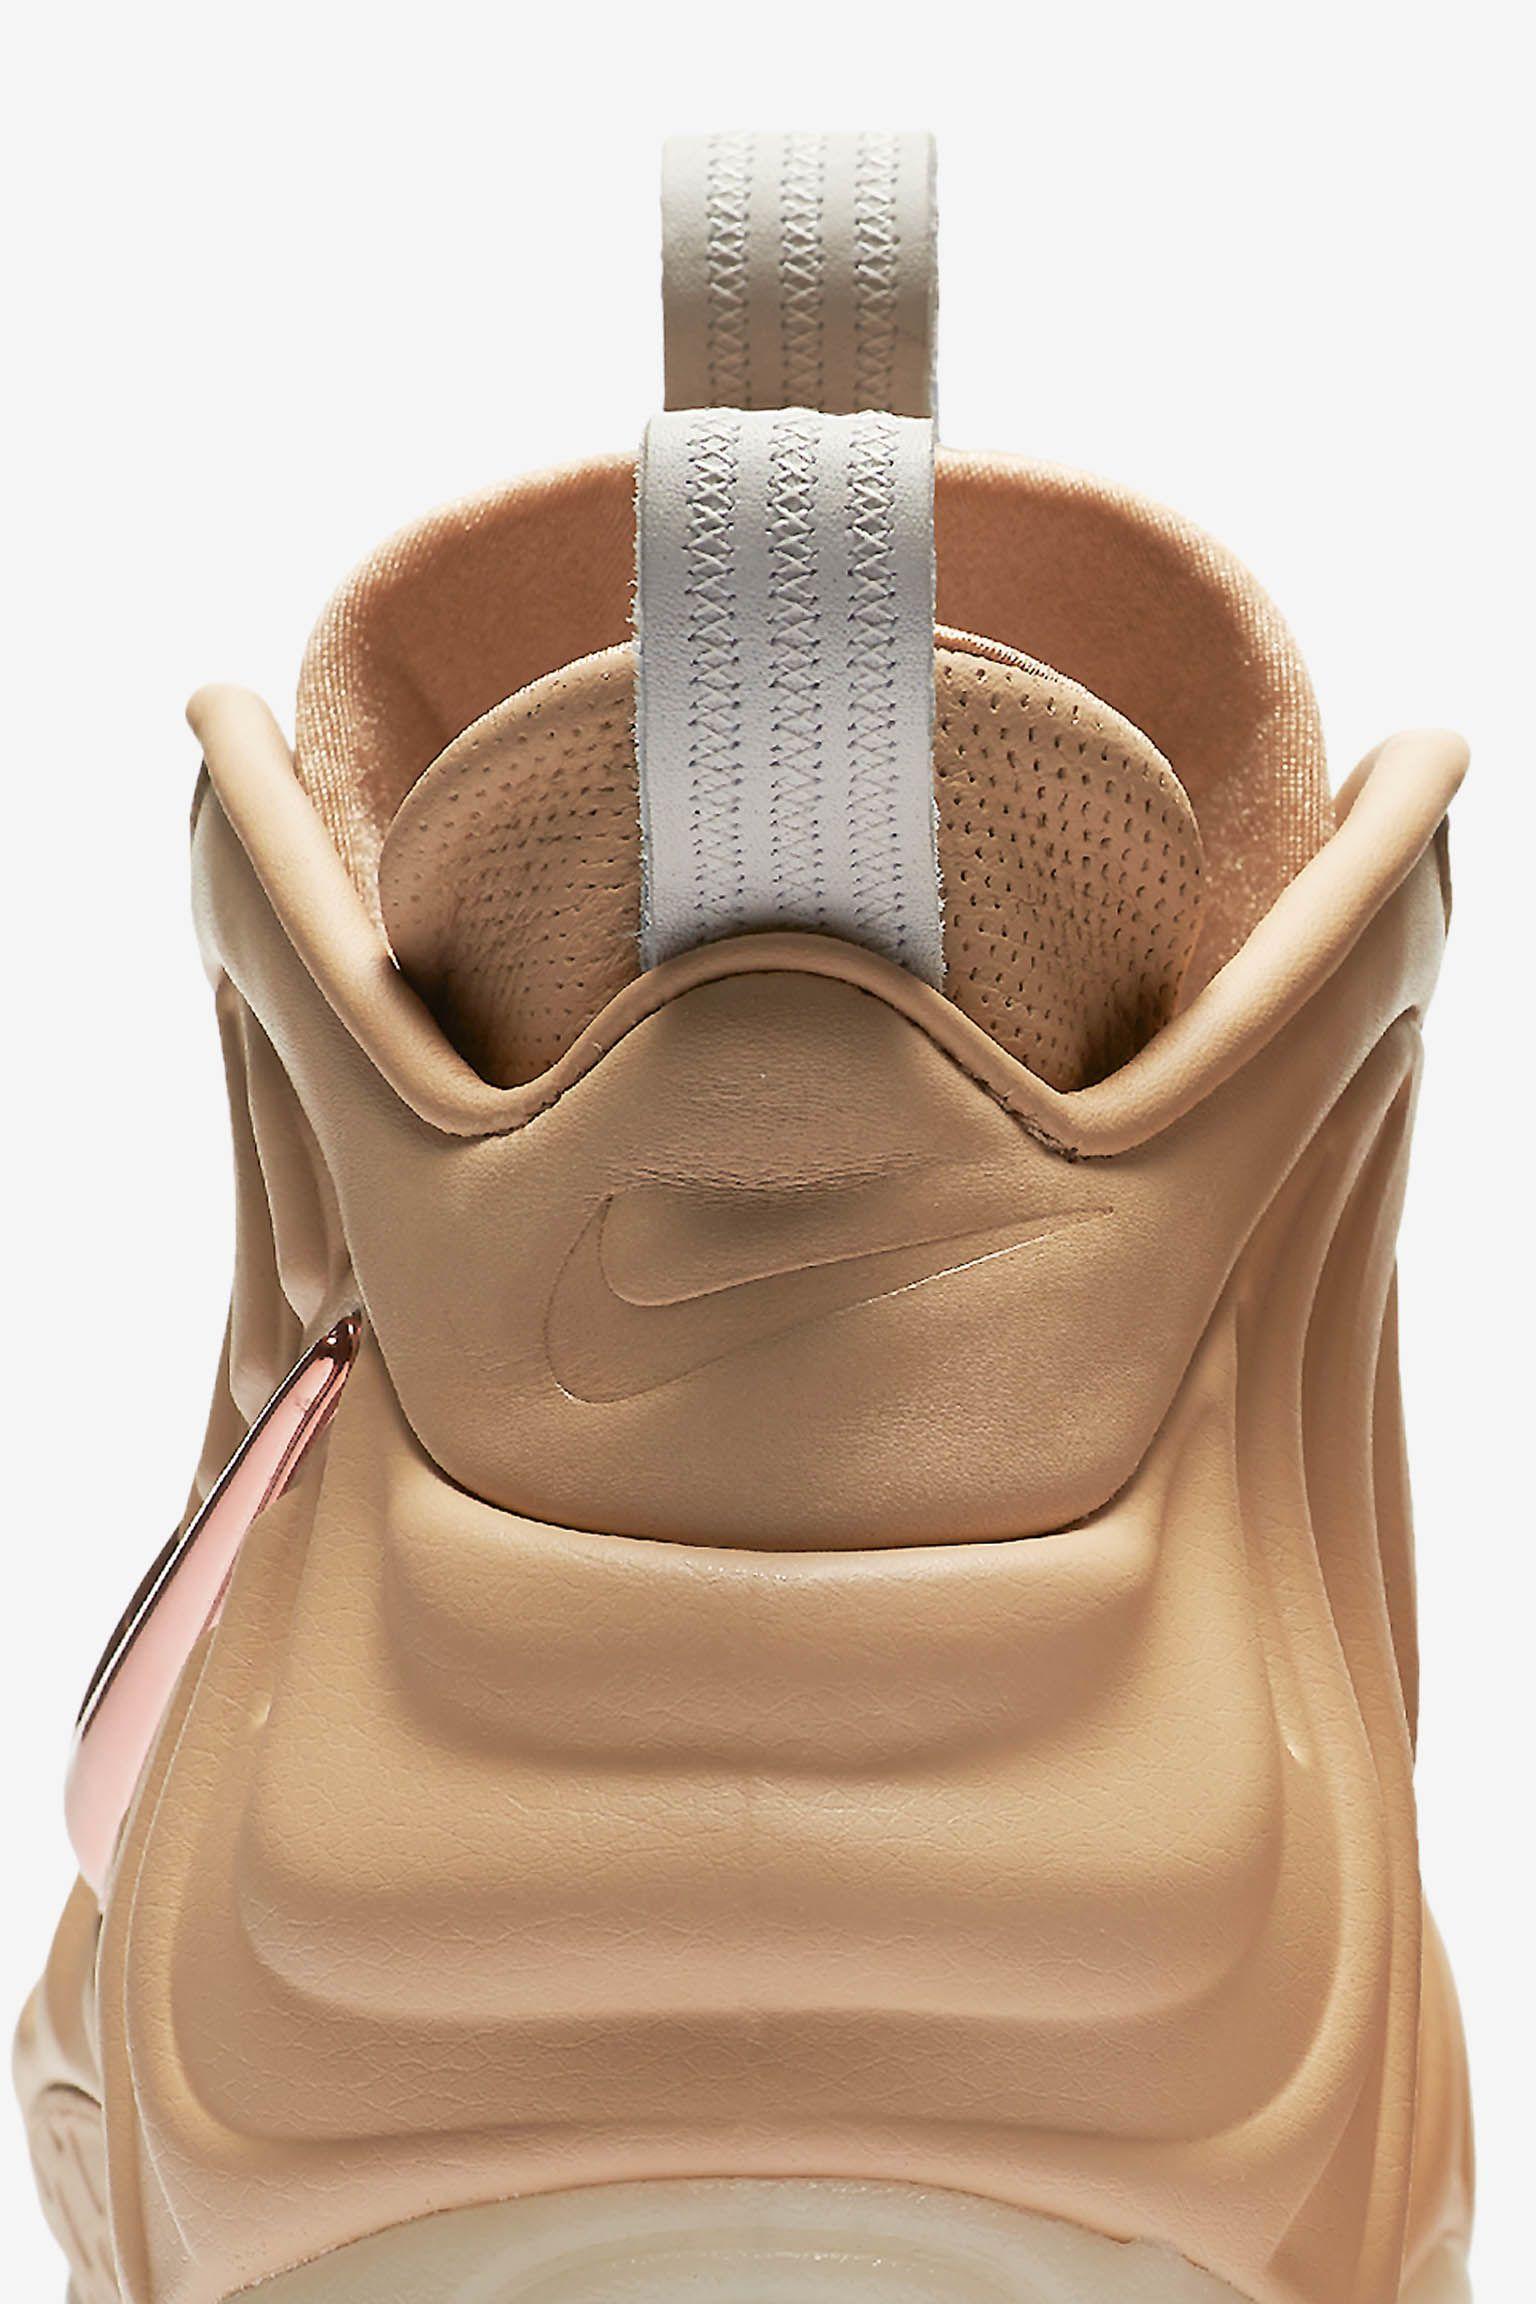 Nike Air Foamposite Pro 'Vachetta Tan & Rose Gold'